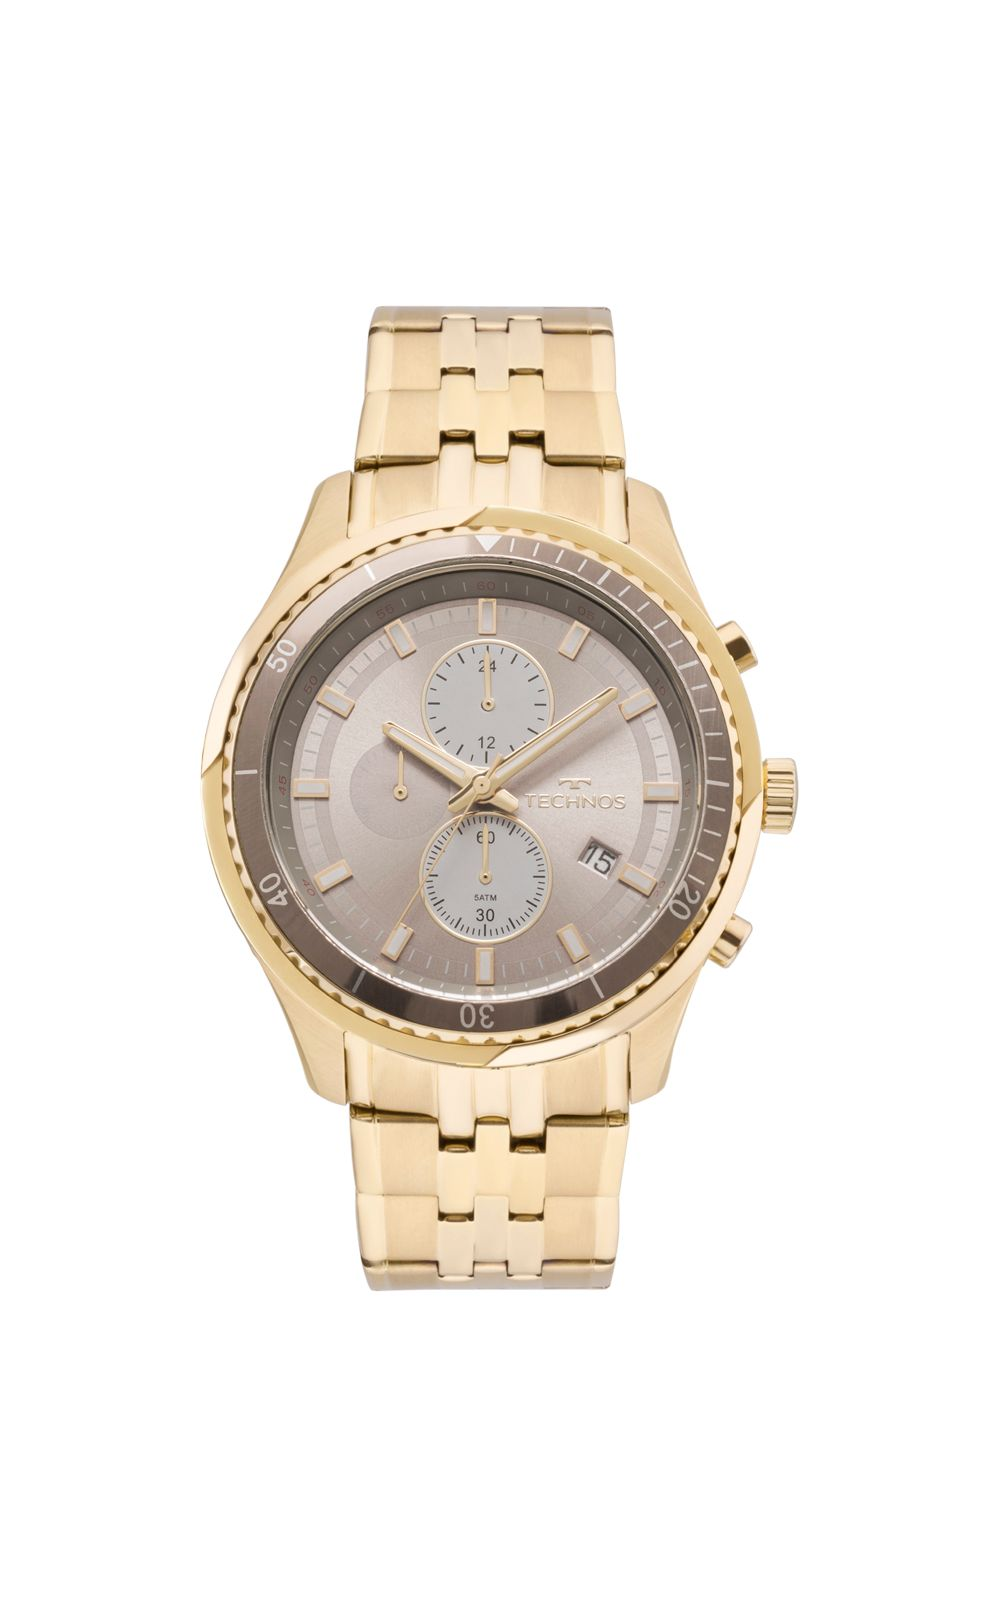 5751410baa2 Relógio Technos Masculino Skymaster Dourado - JS15FE 4C. undefined